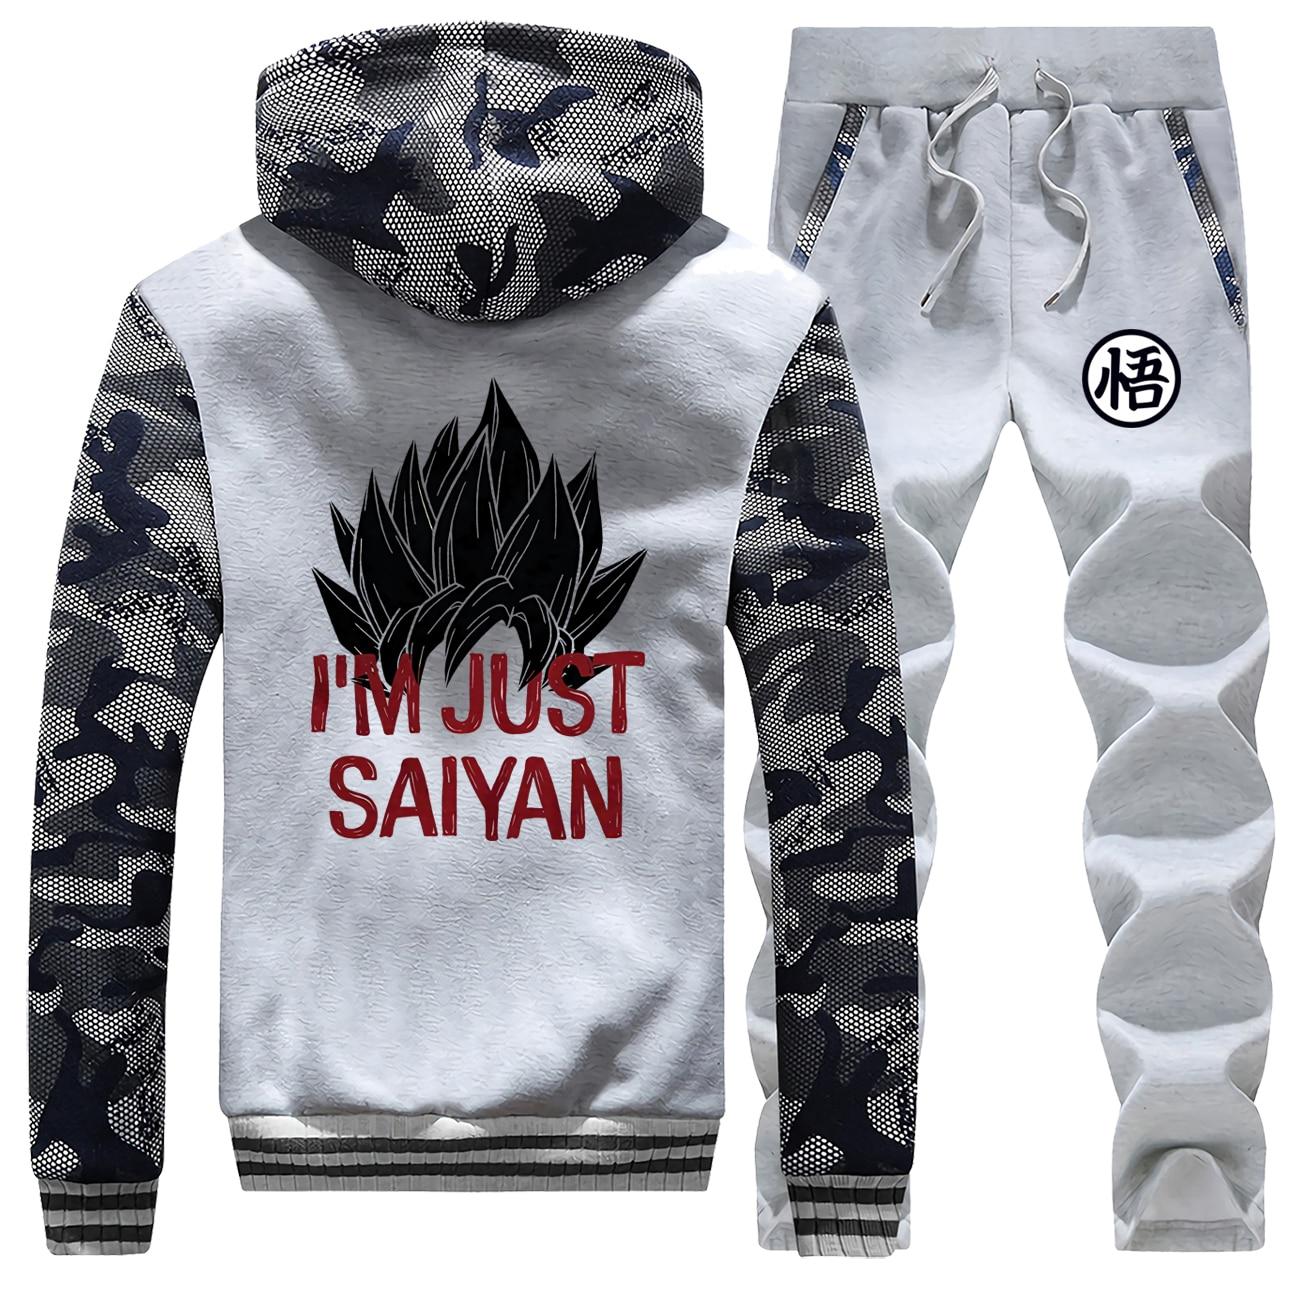 I'm Just Saiyan Male Set Dragon Ball Z Casual Sportsman Wear 2019 Winter Fleece Harajuku Suit Men Japan Anime Camo Sets Hoodies